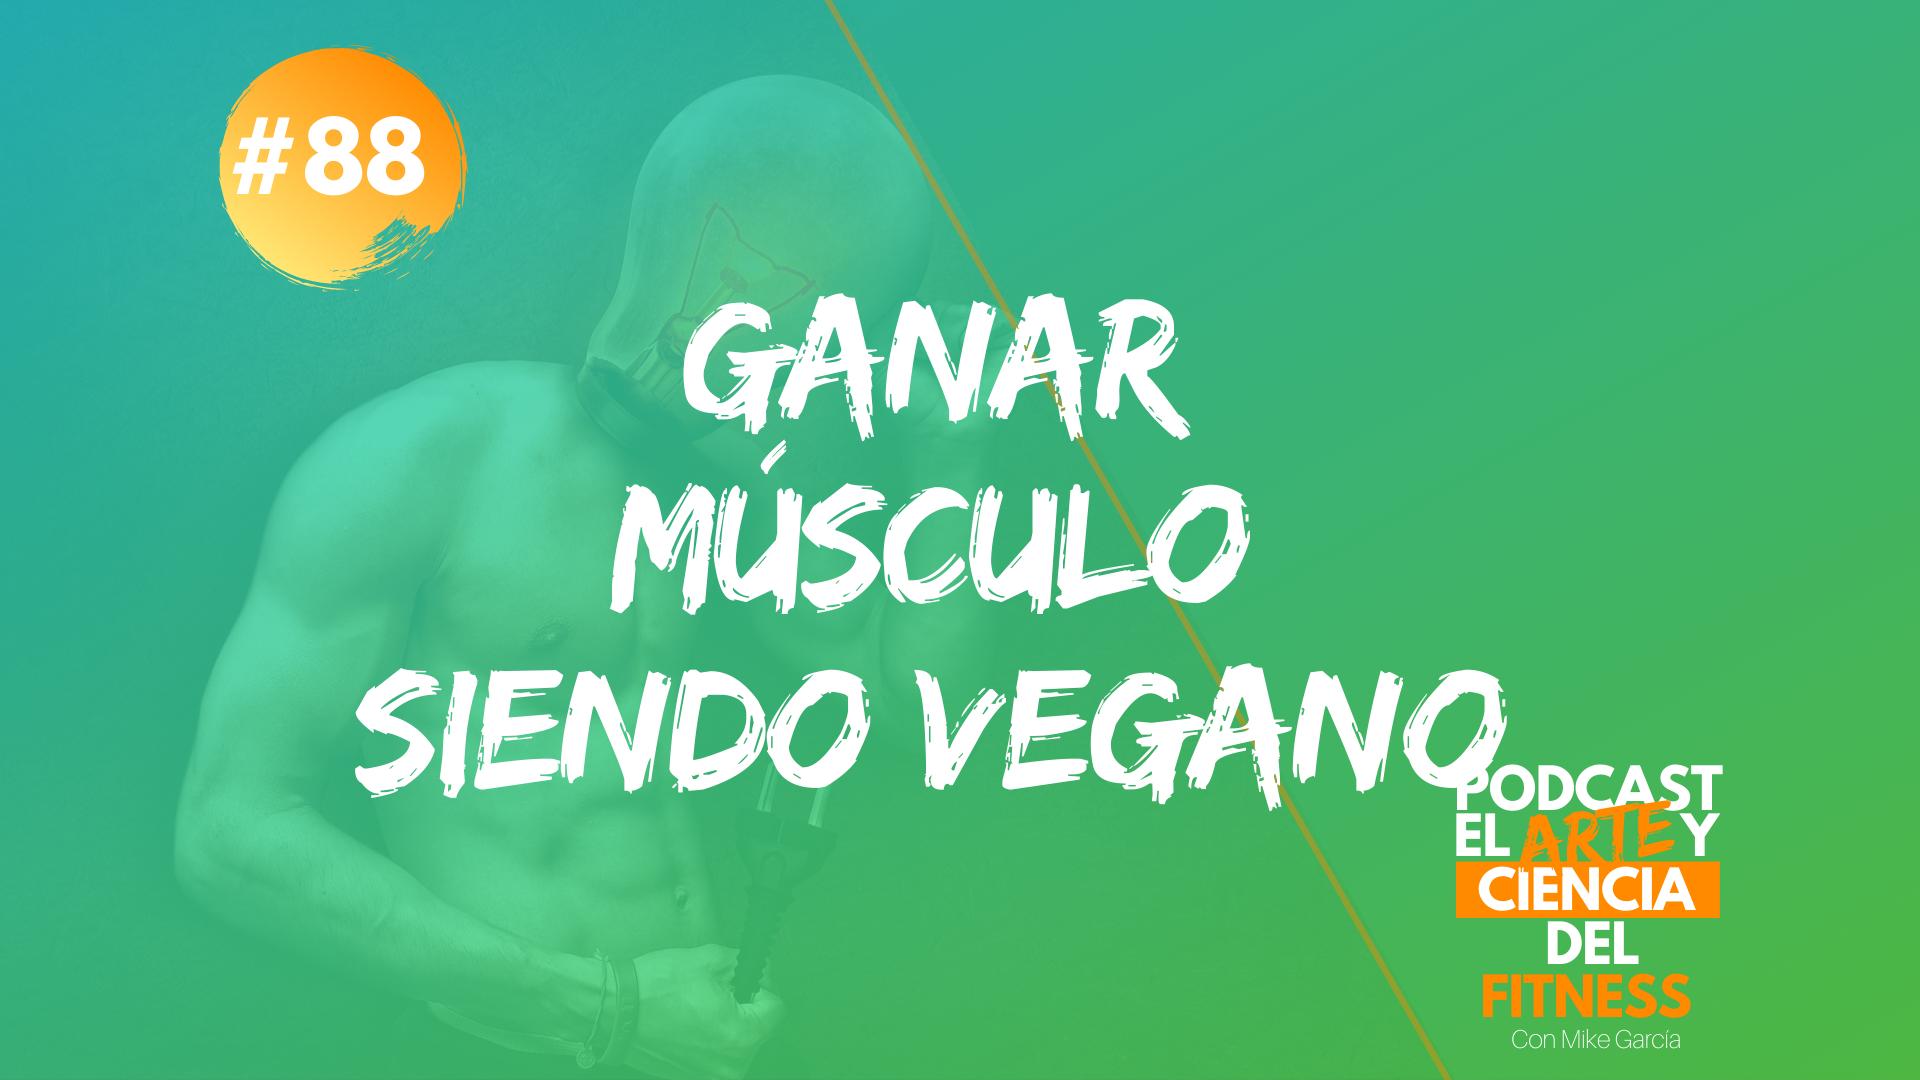 Podcast #88: Ganar Músculo Siendo Vegano